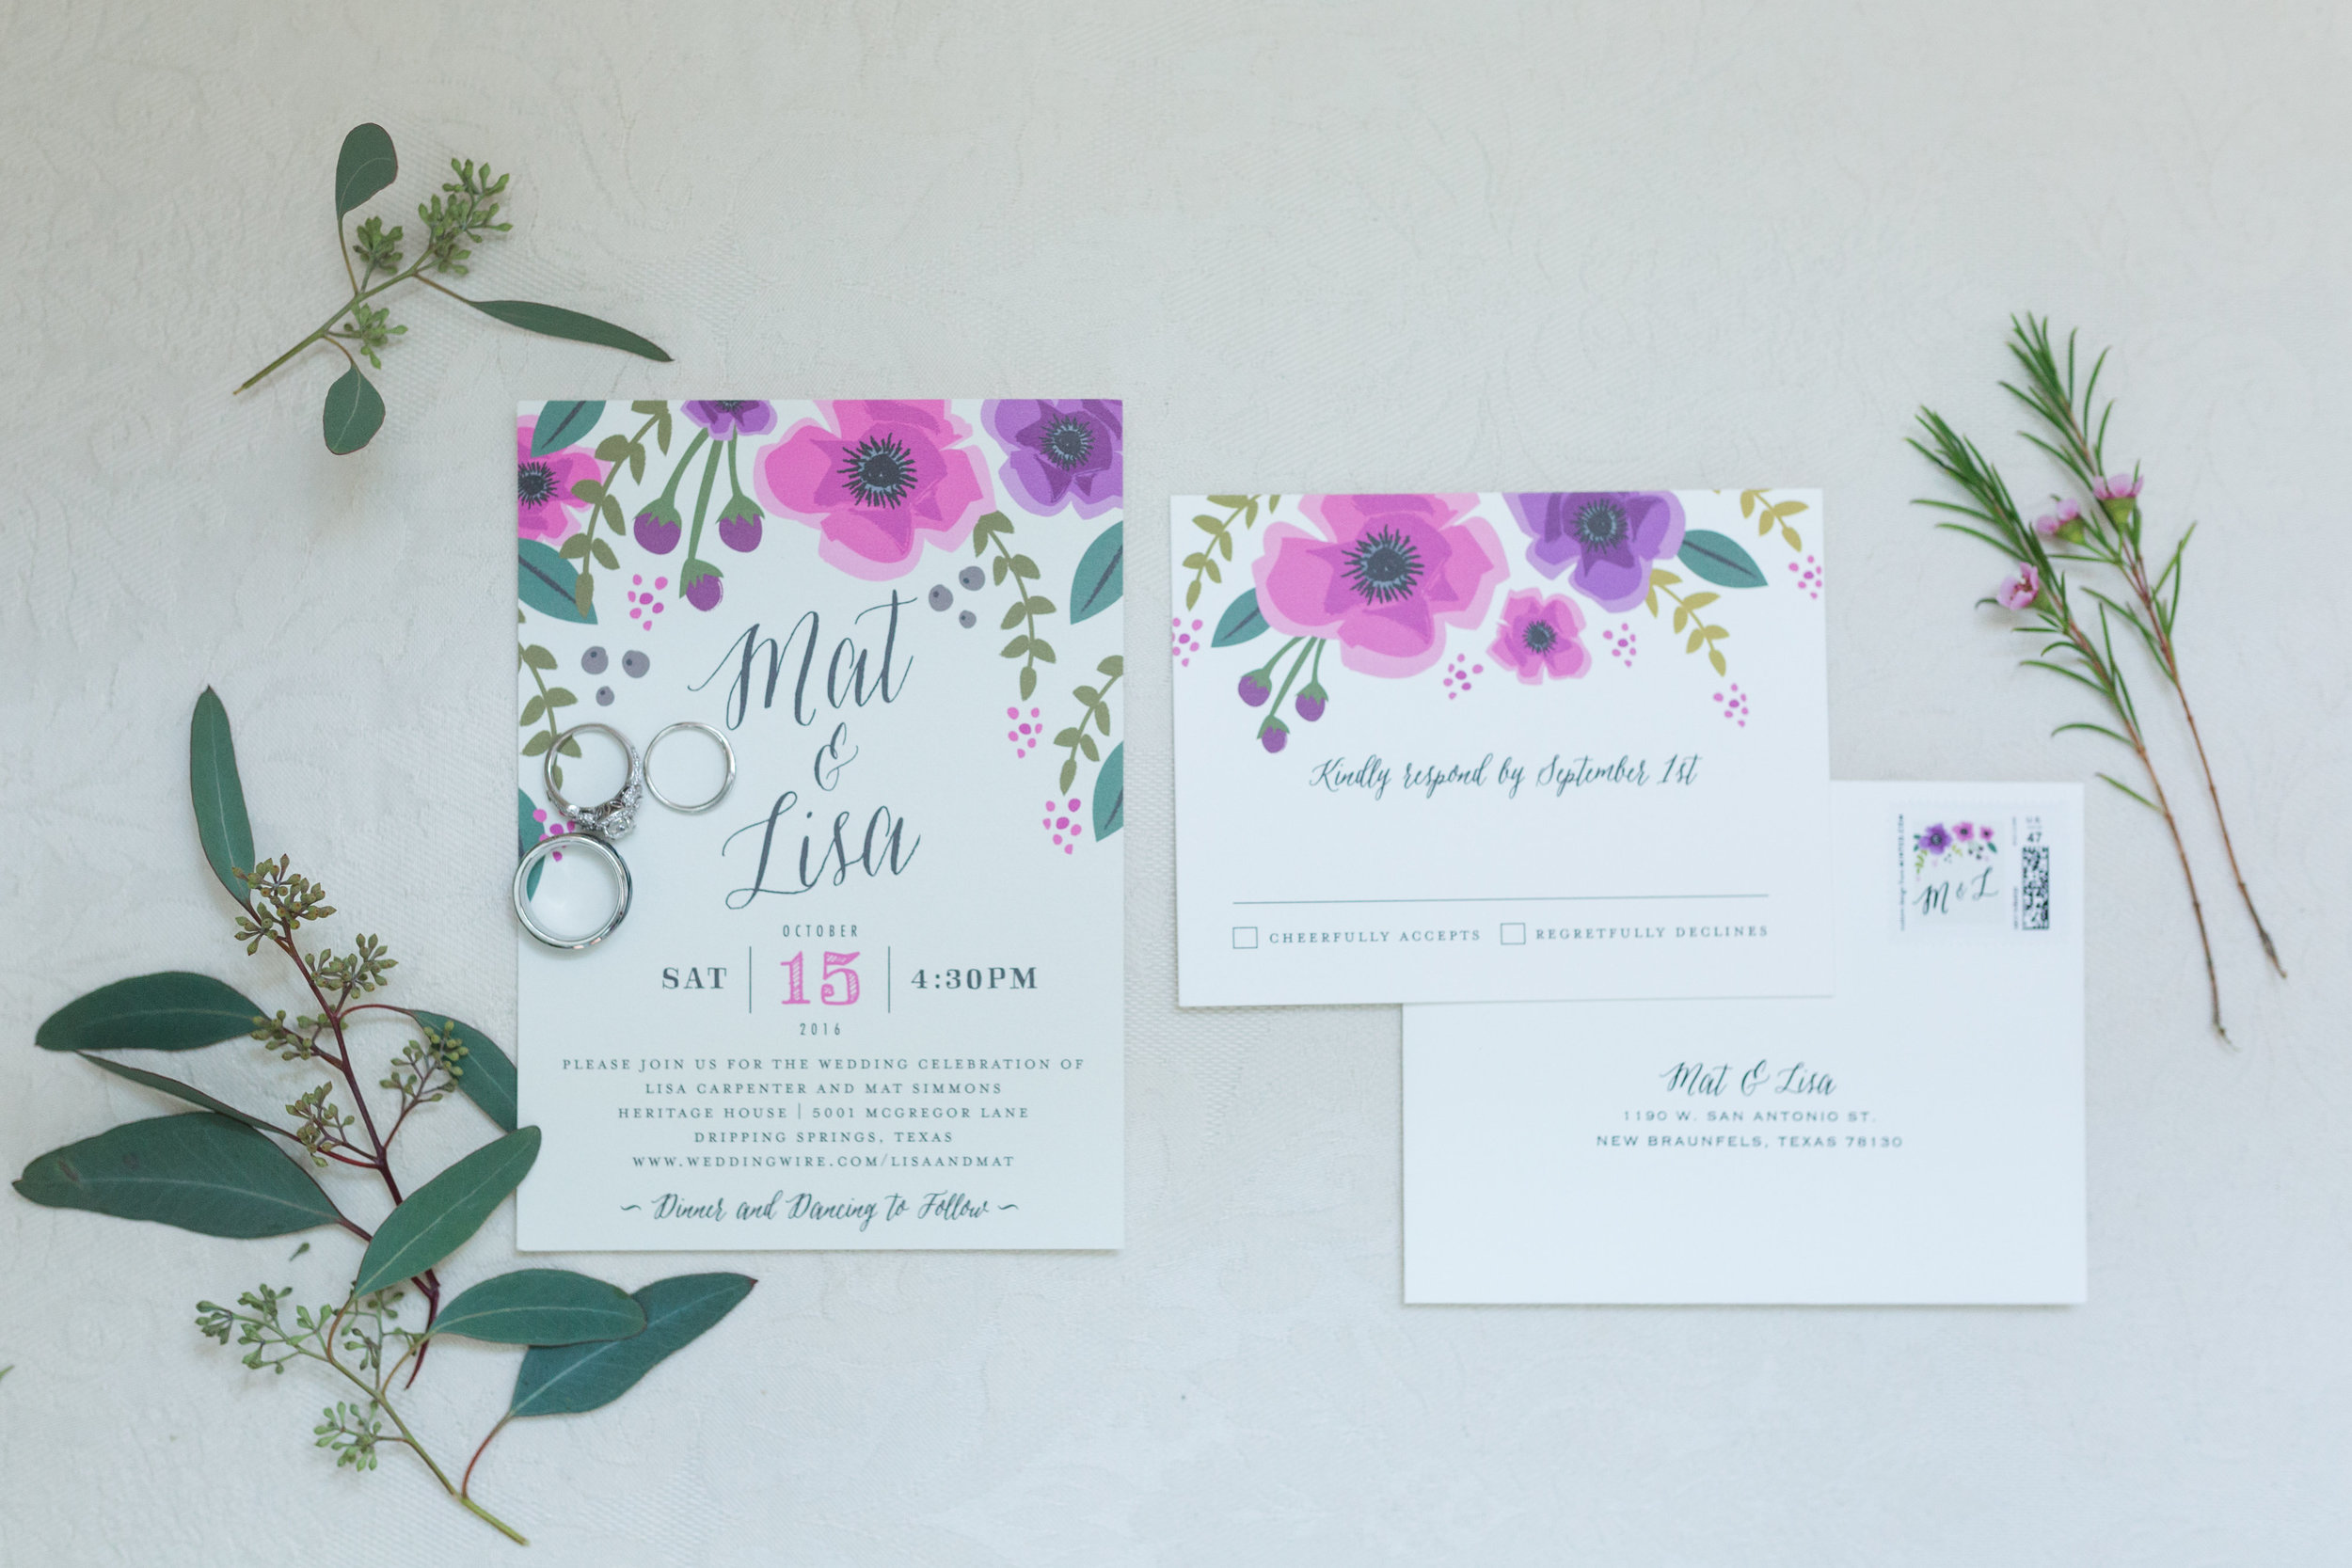 Floral Watercolor Wedding Invitations - Heritage House - Georgetown, Texas Wedding Venue